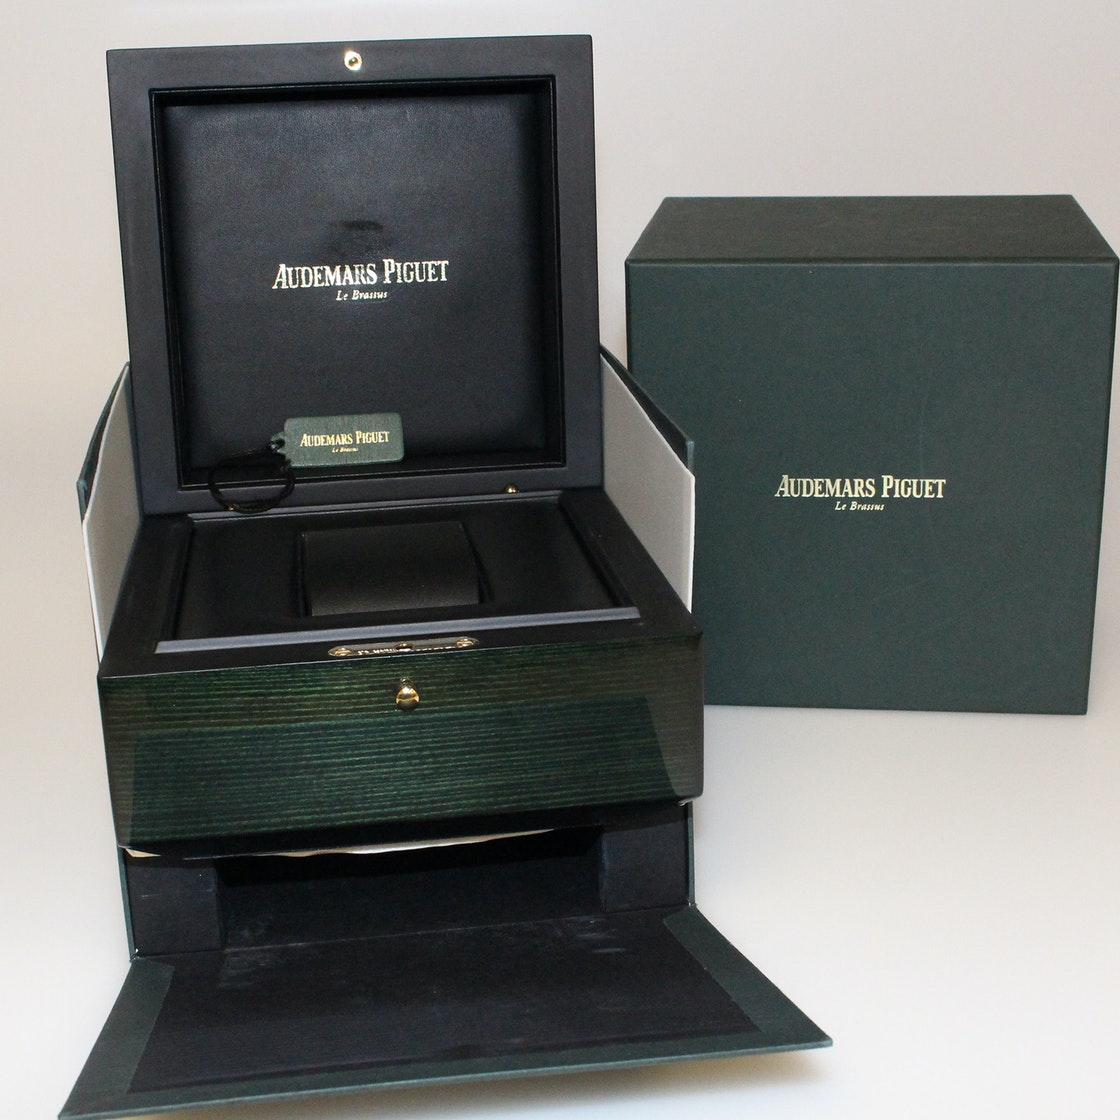 Audemar Piguet Royal Oak Offshore Chronograph 26405CE.OO.A002CA.01